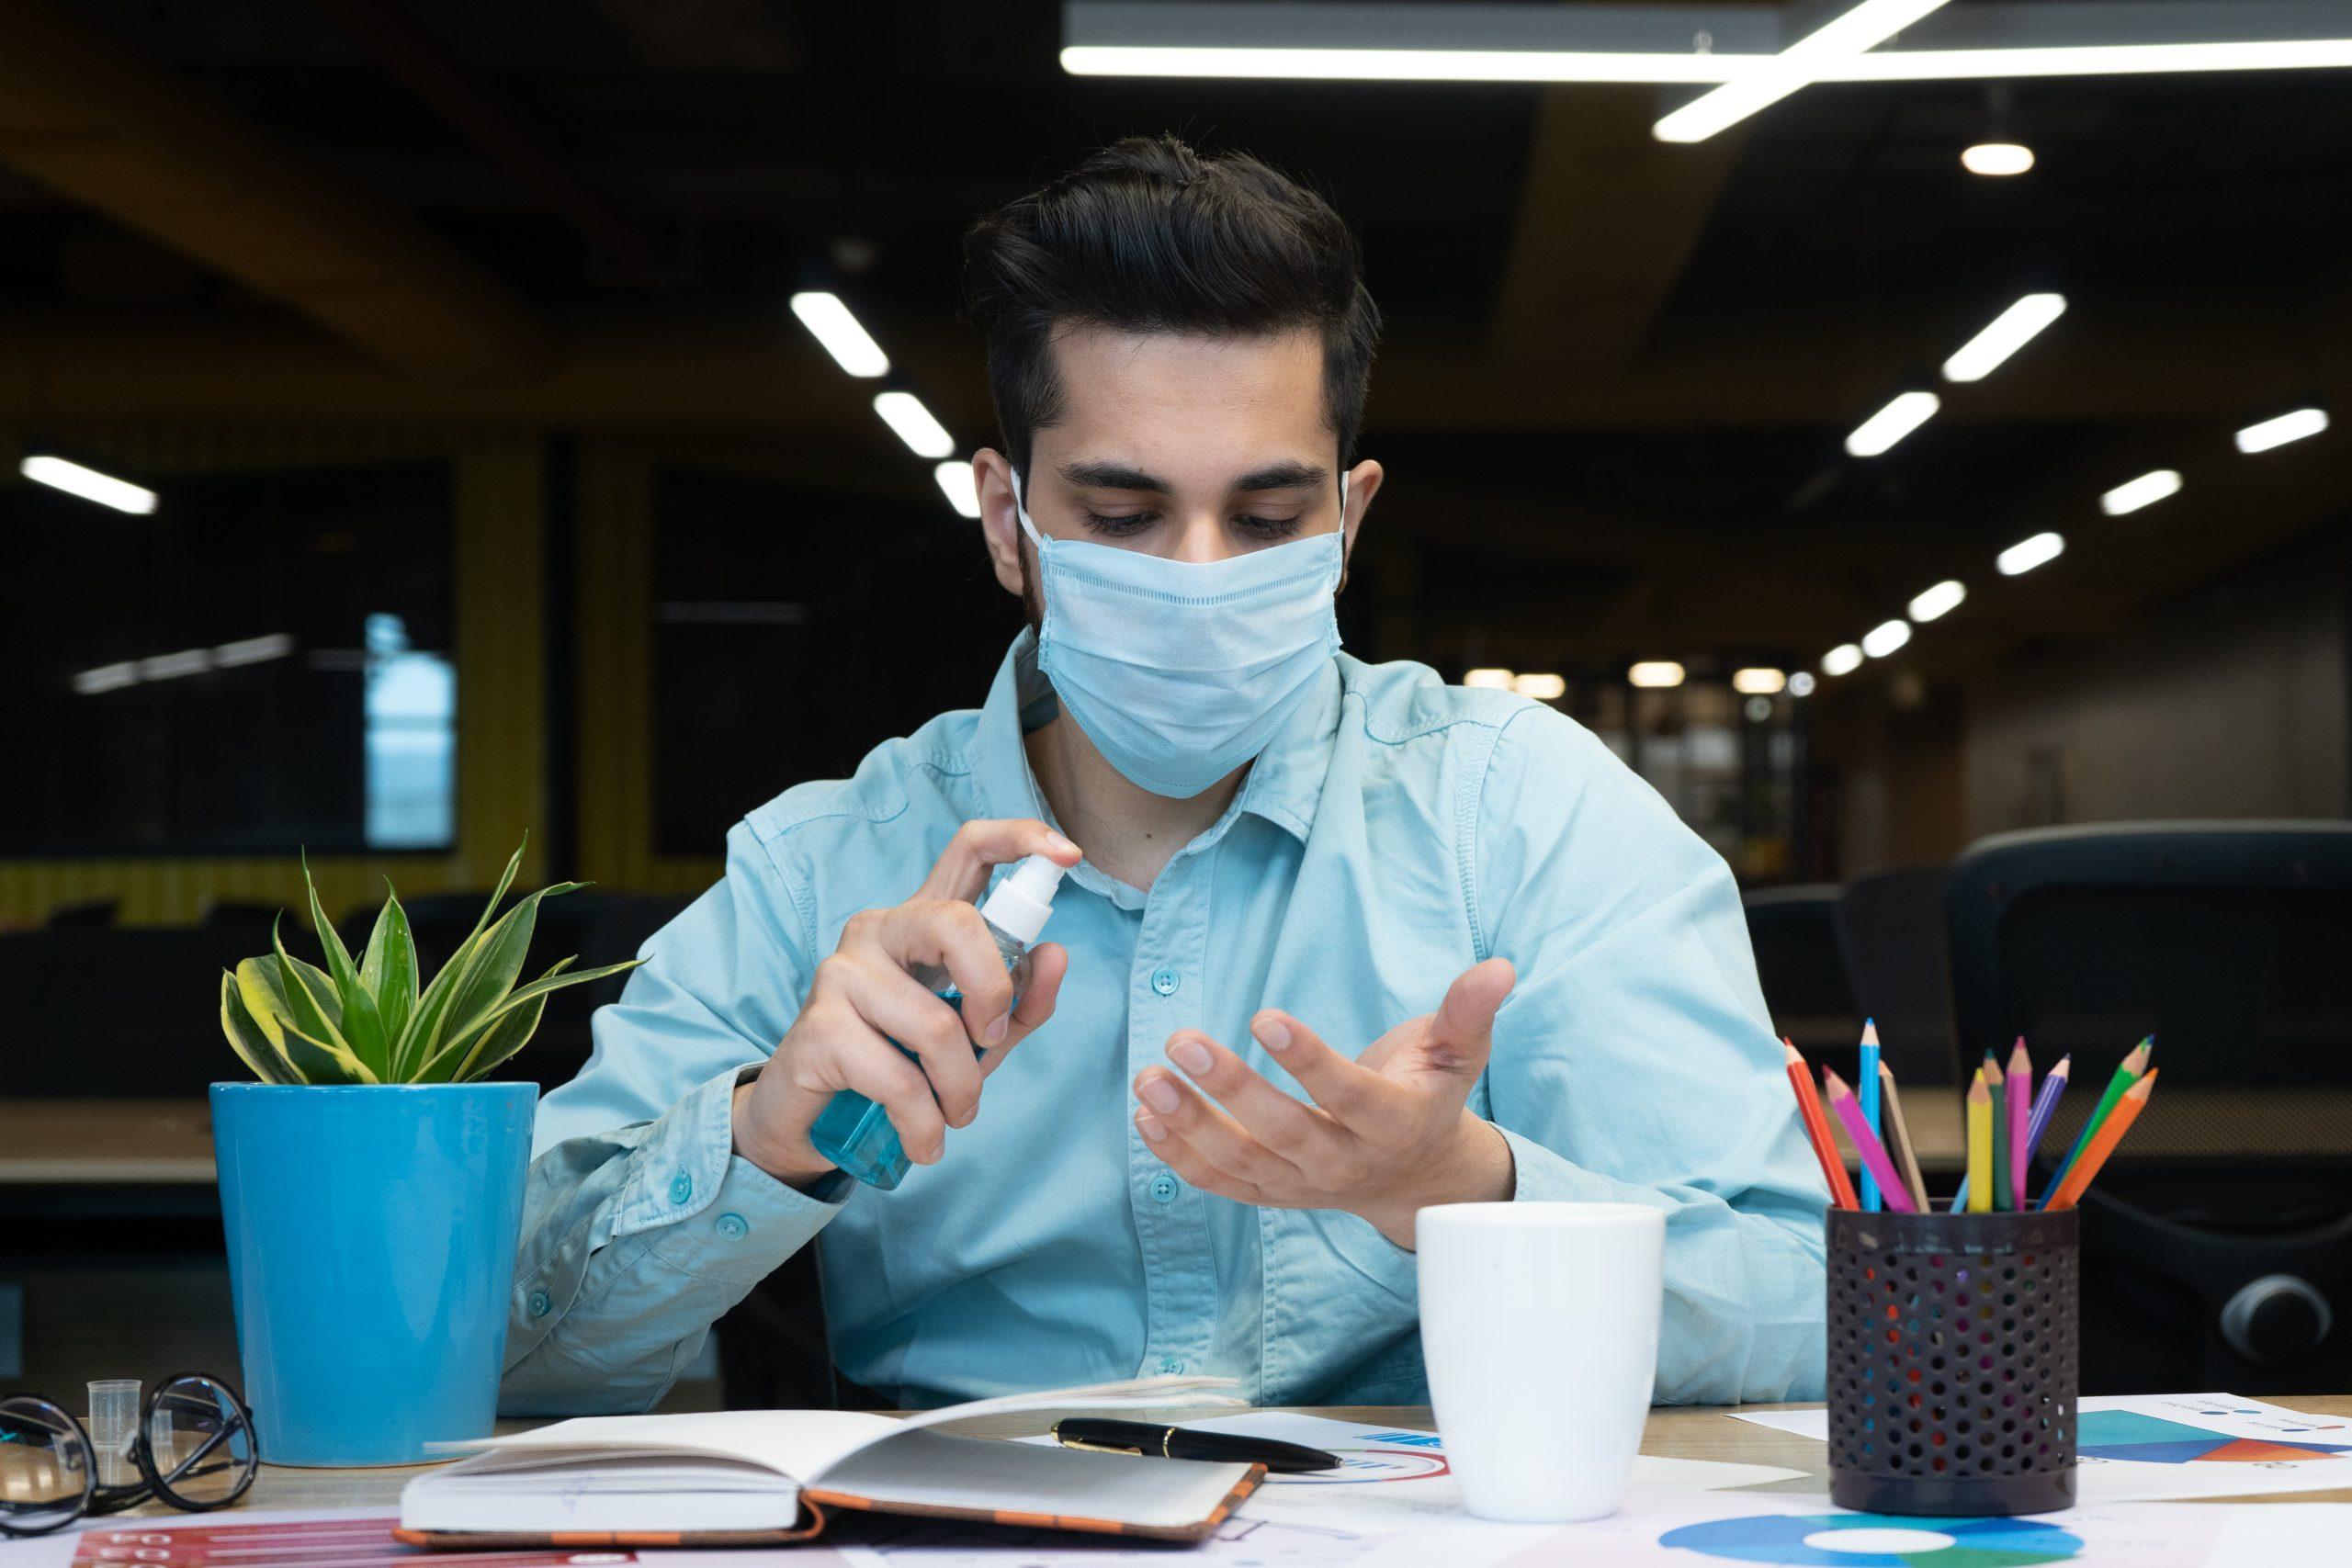 An employee sanitizing his hands